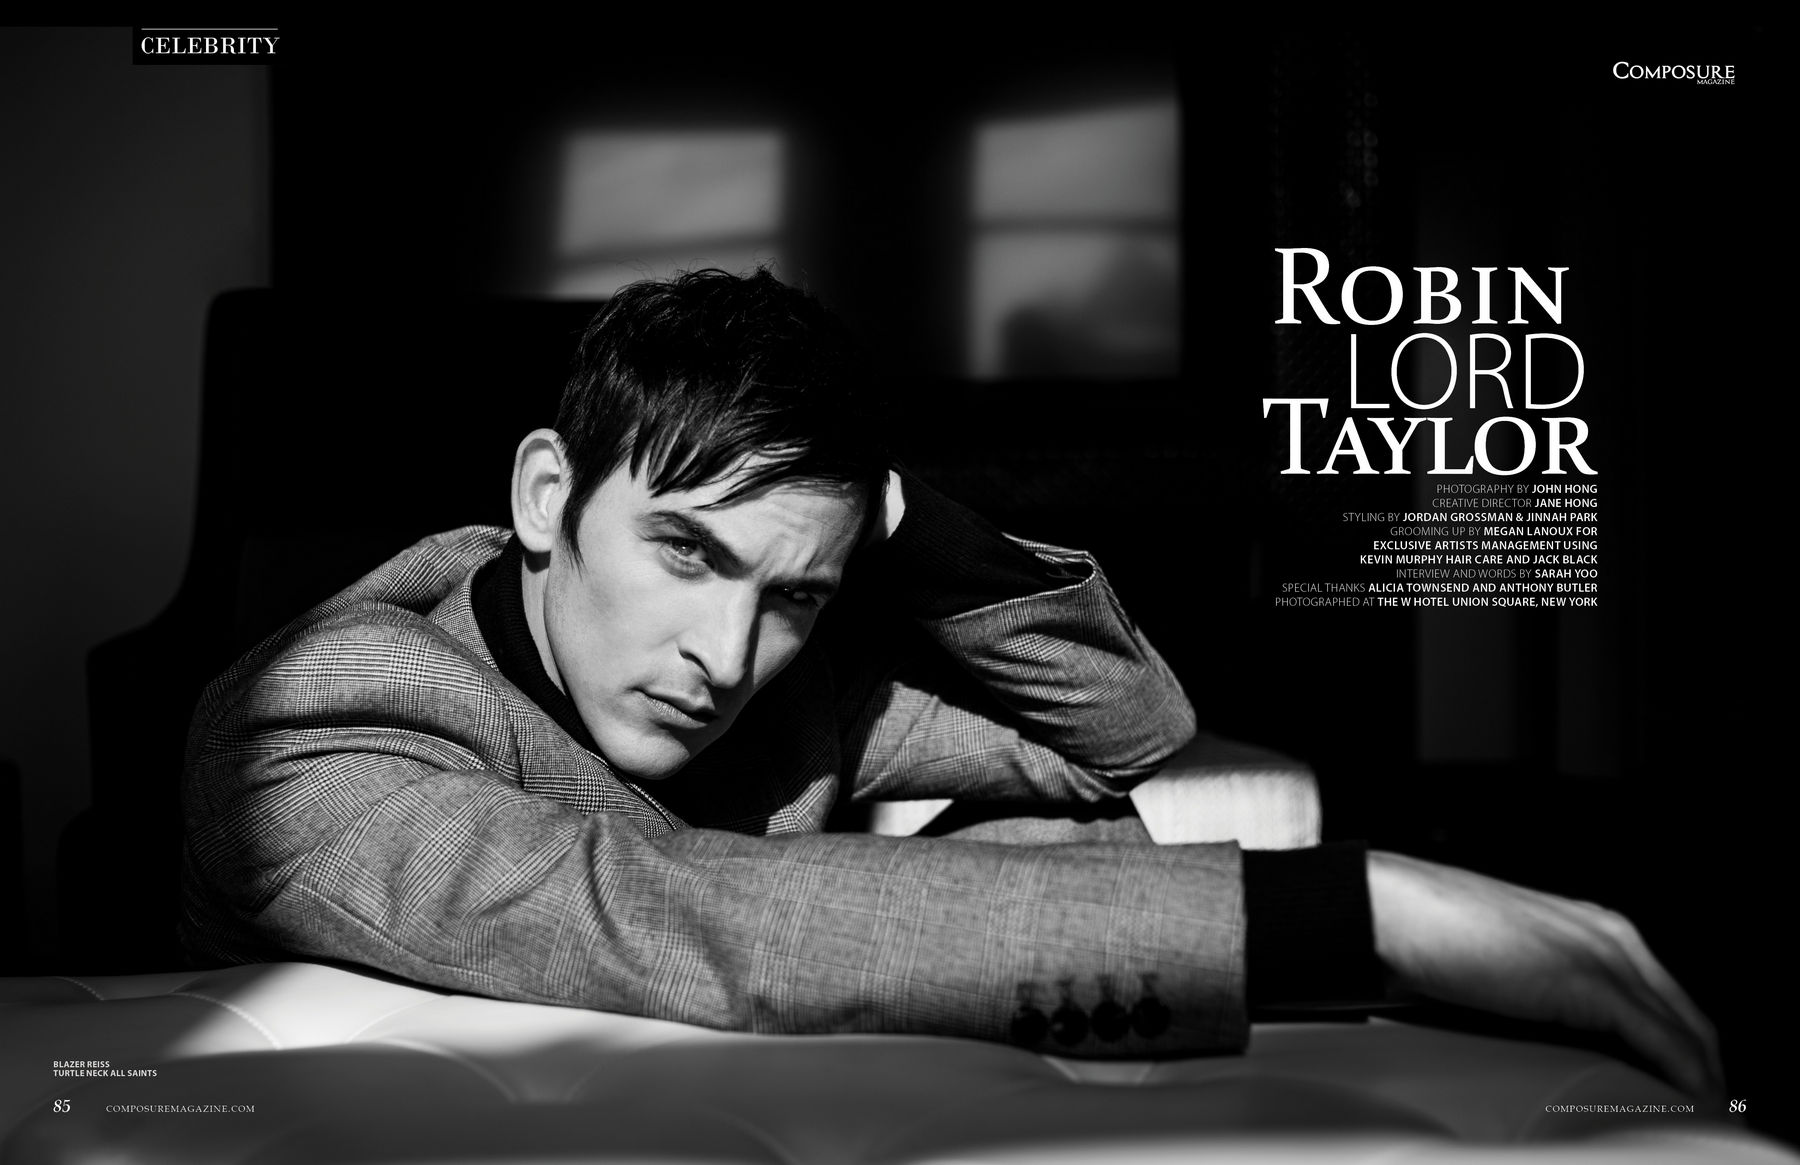 Robin Lord Taylor